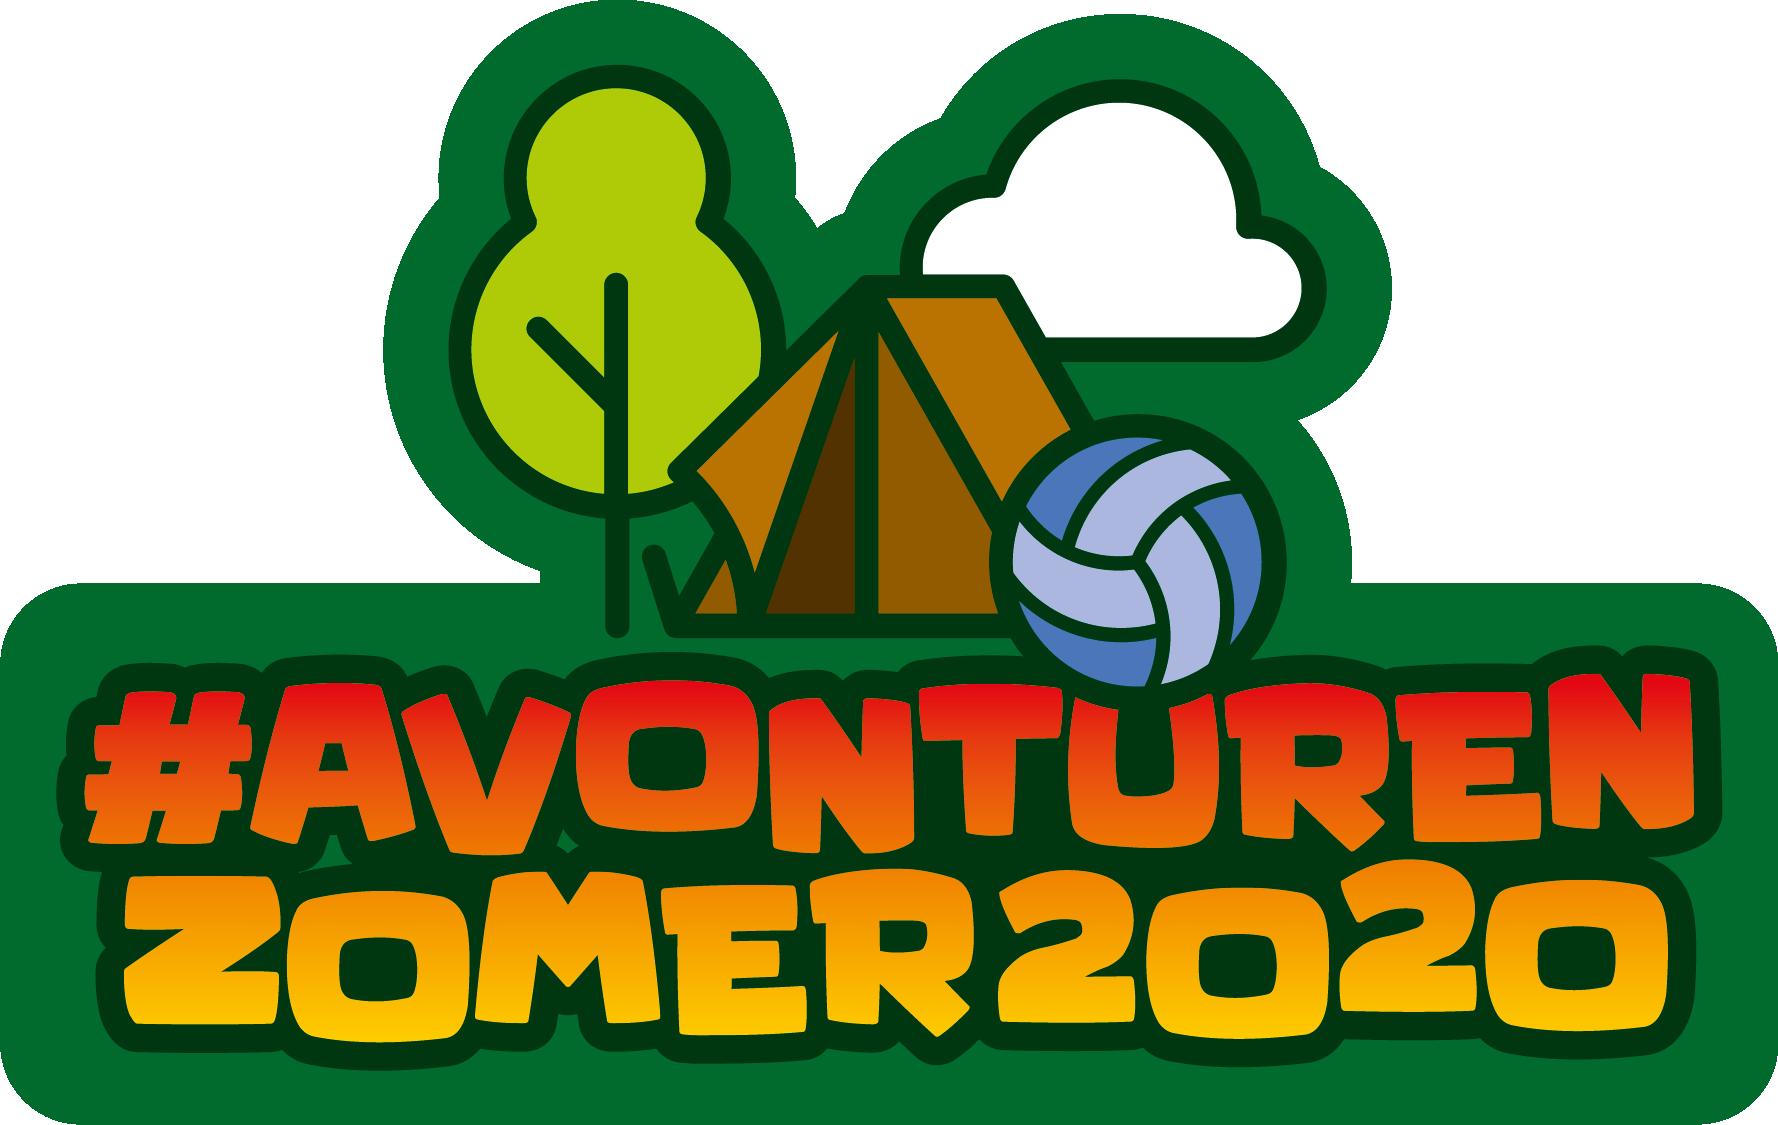 Avonturenzomer 2020 - We gaan op zomerkamp!